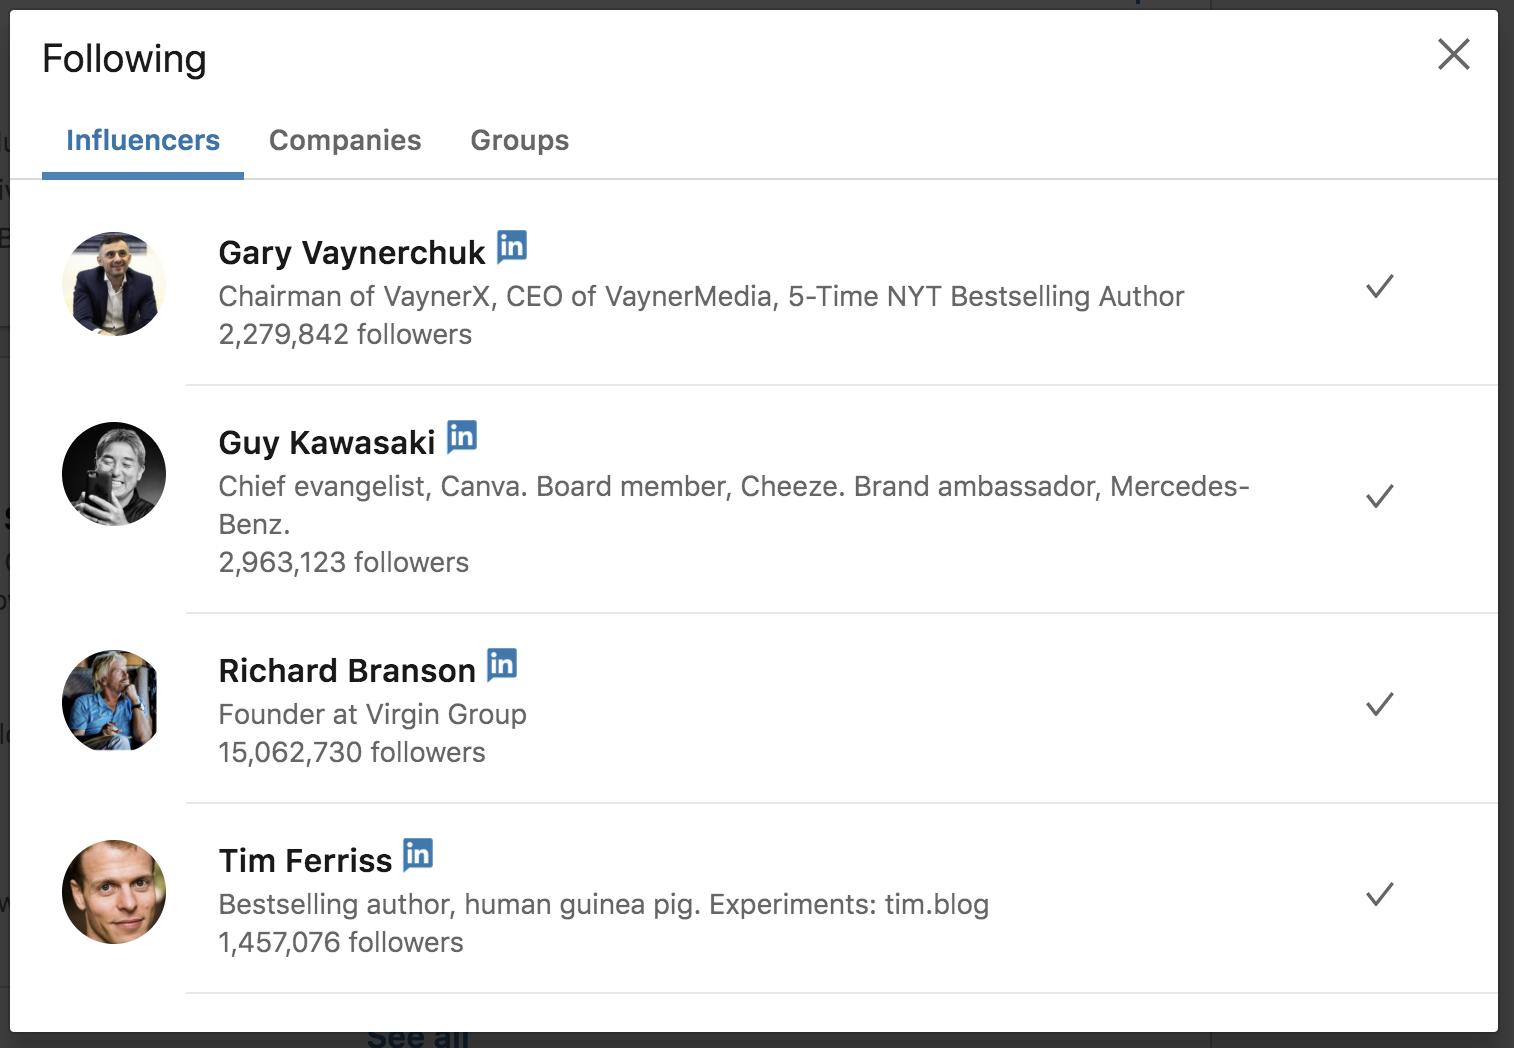 Gary Vaynerchuk LinkedIn